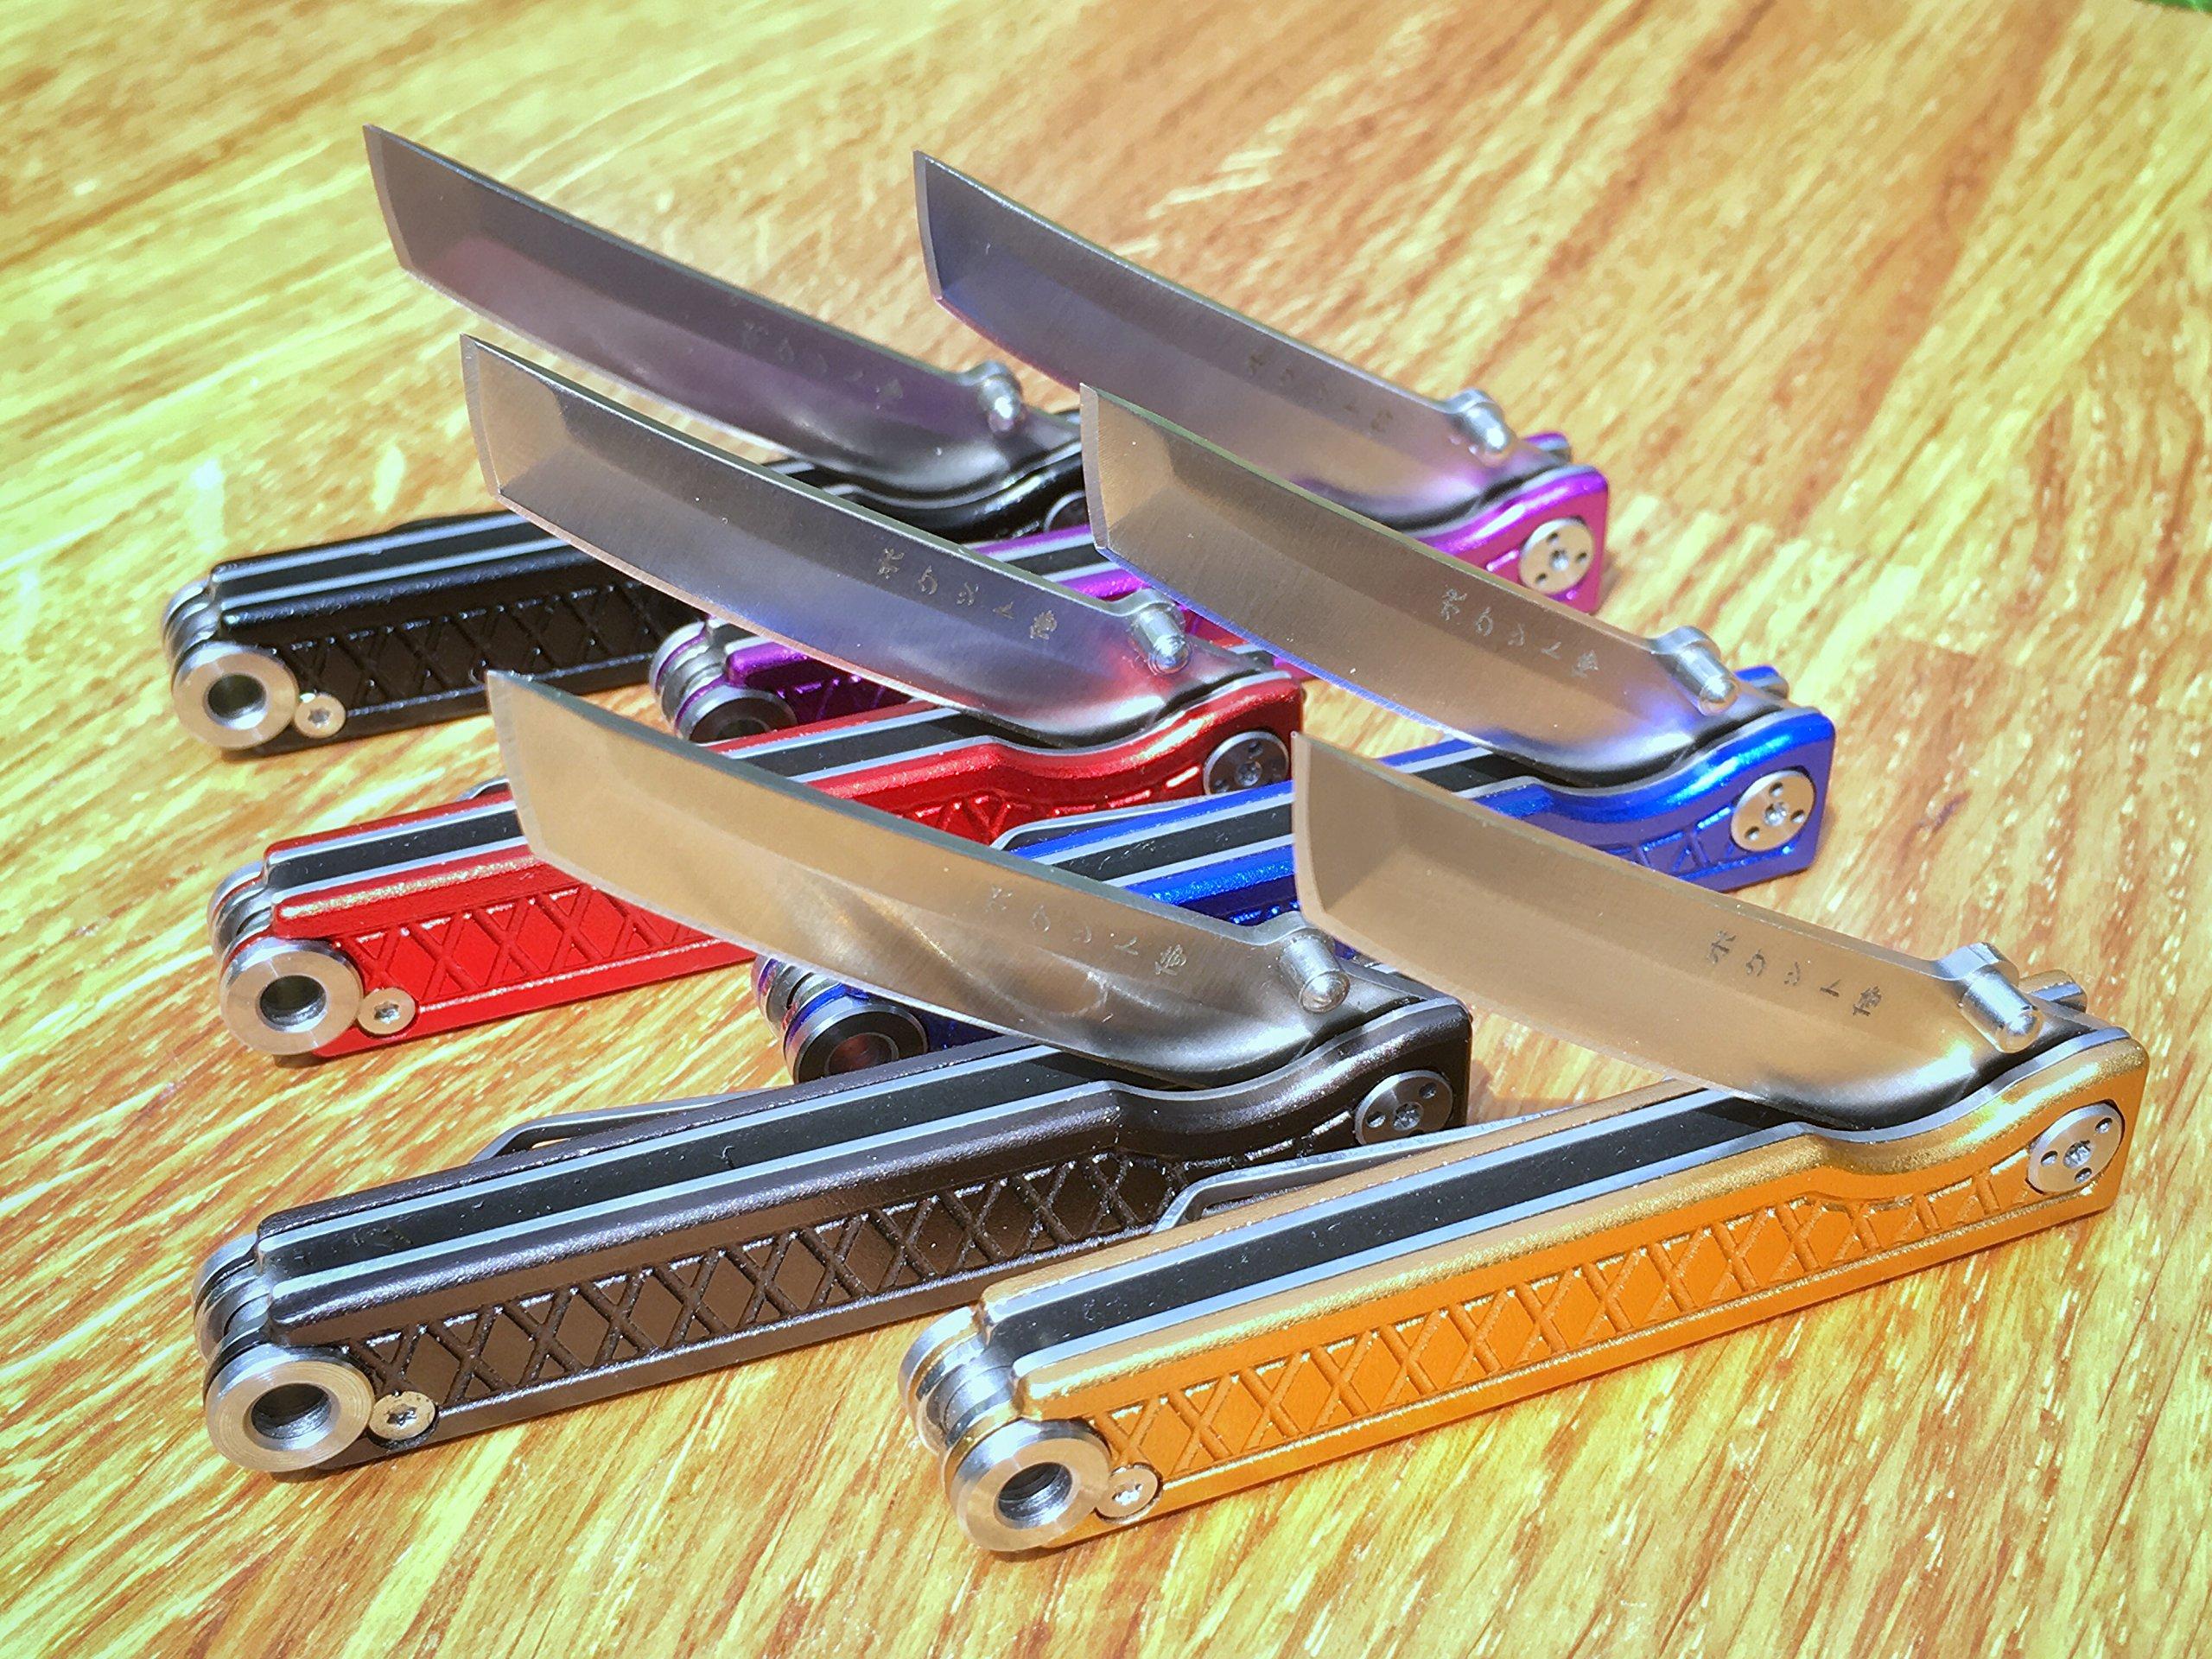 StatGear Pocket Samurai Linerlock Brnz by StatGear (Image #7)